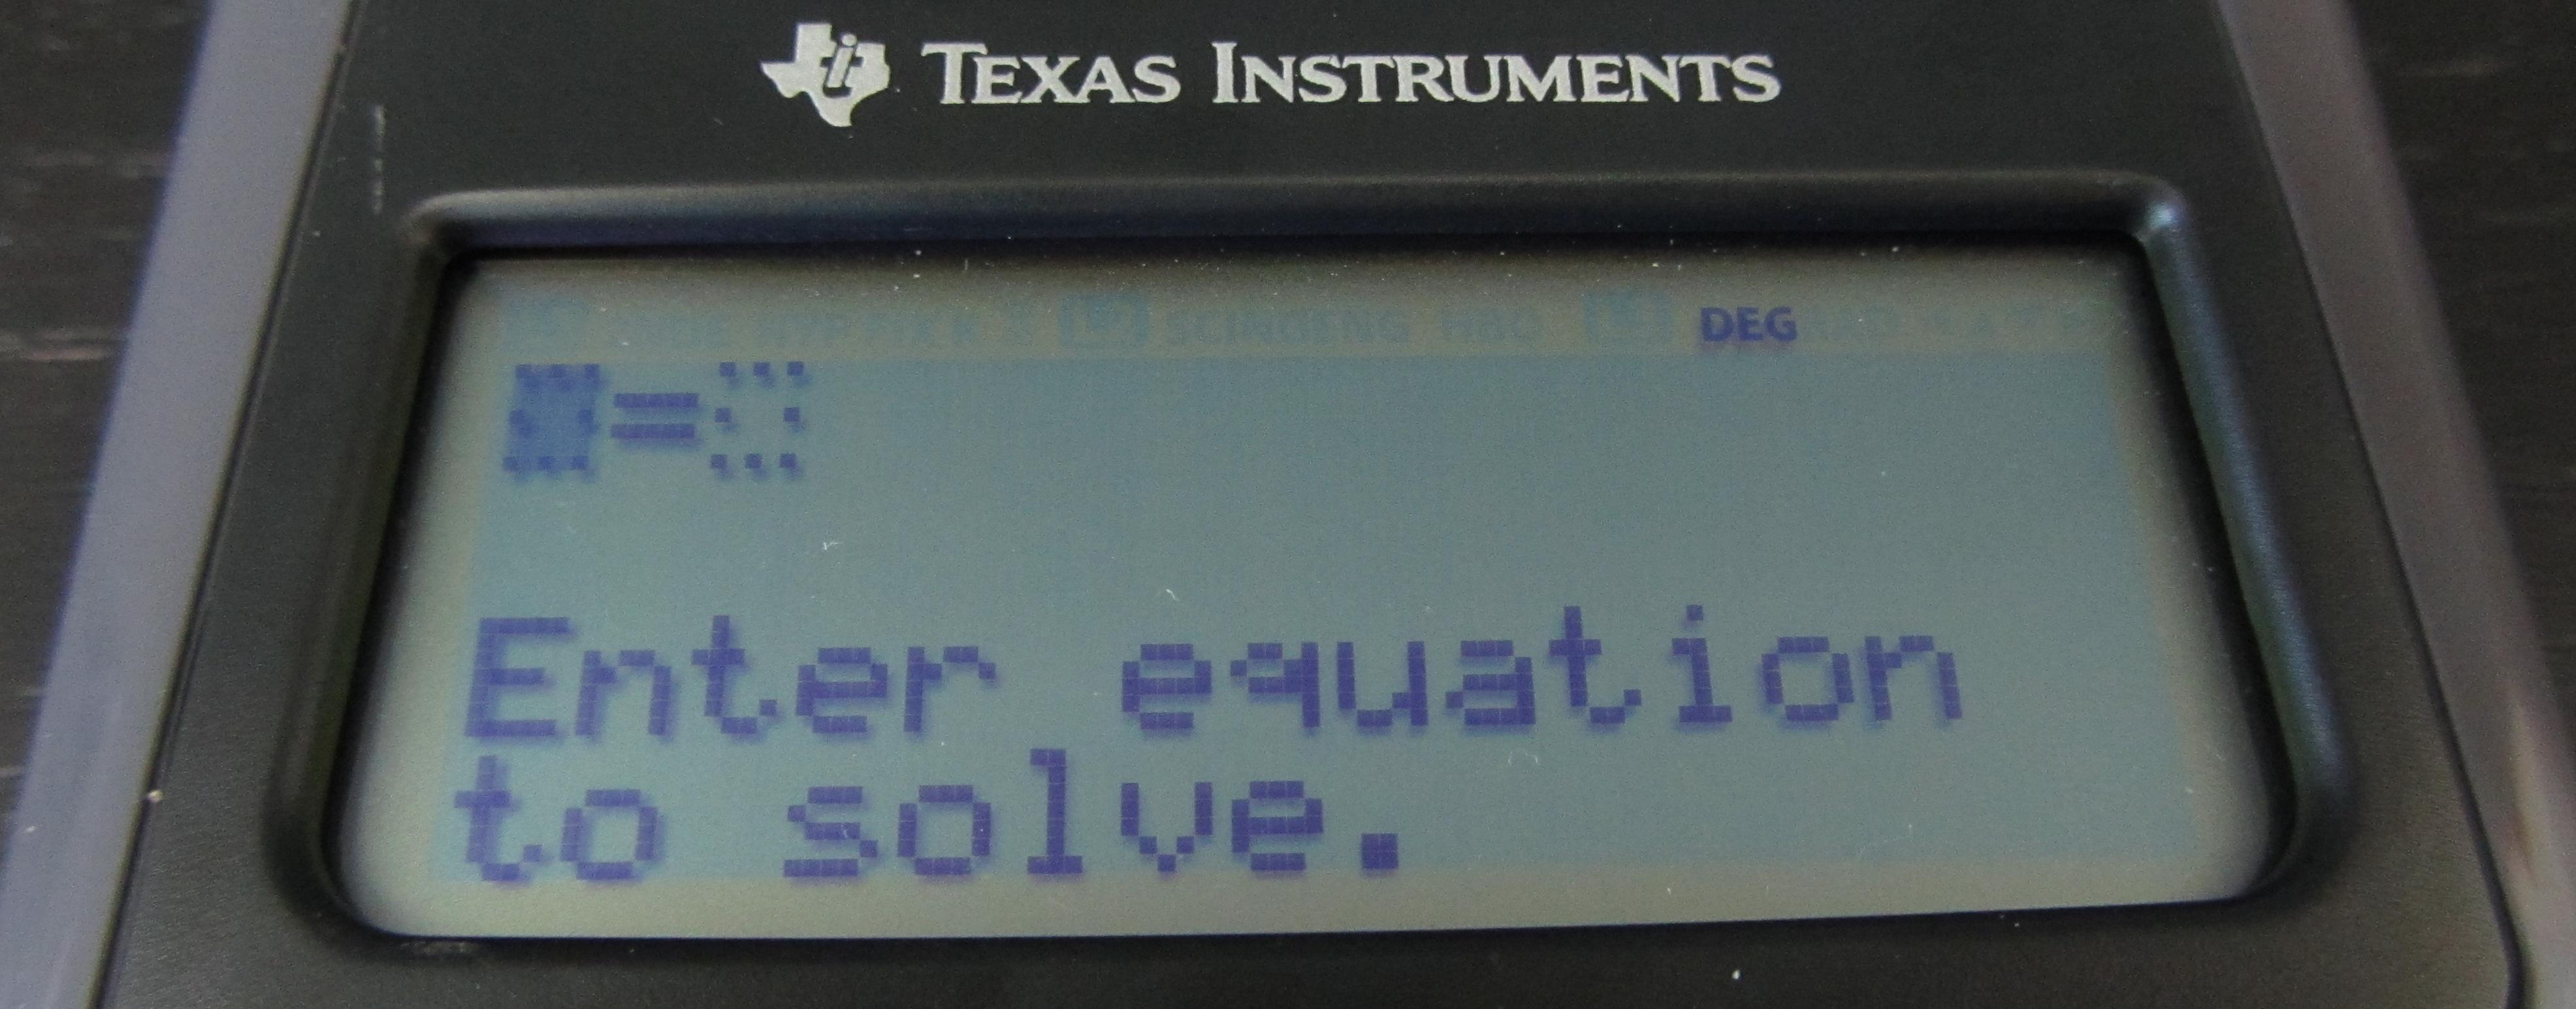 TI-36X Pro Full Review - Math Class Calculator